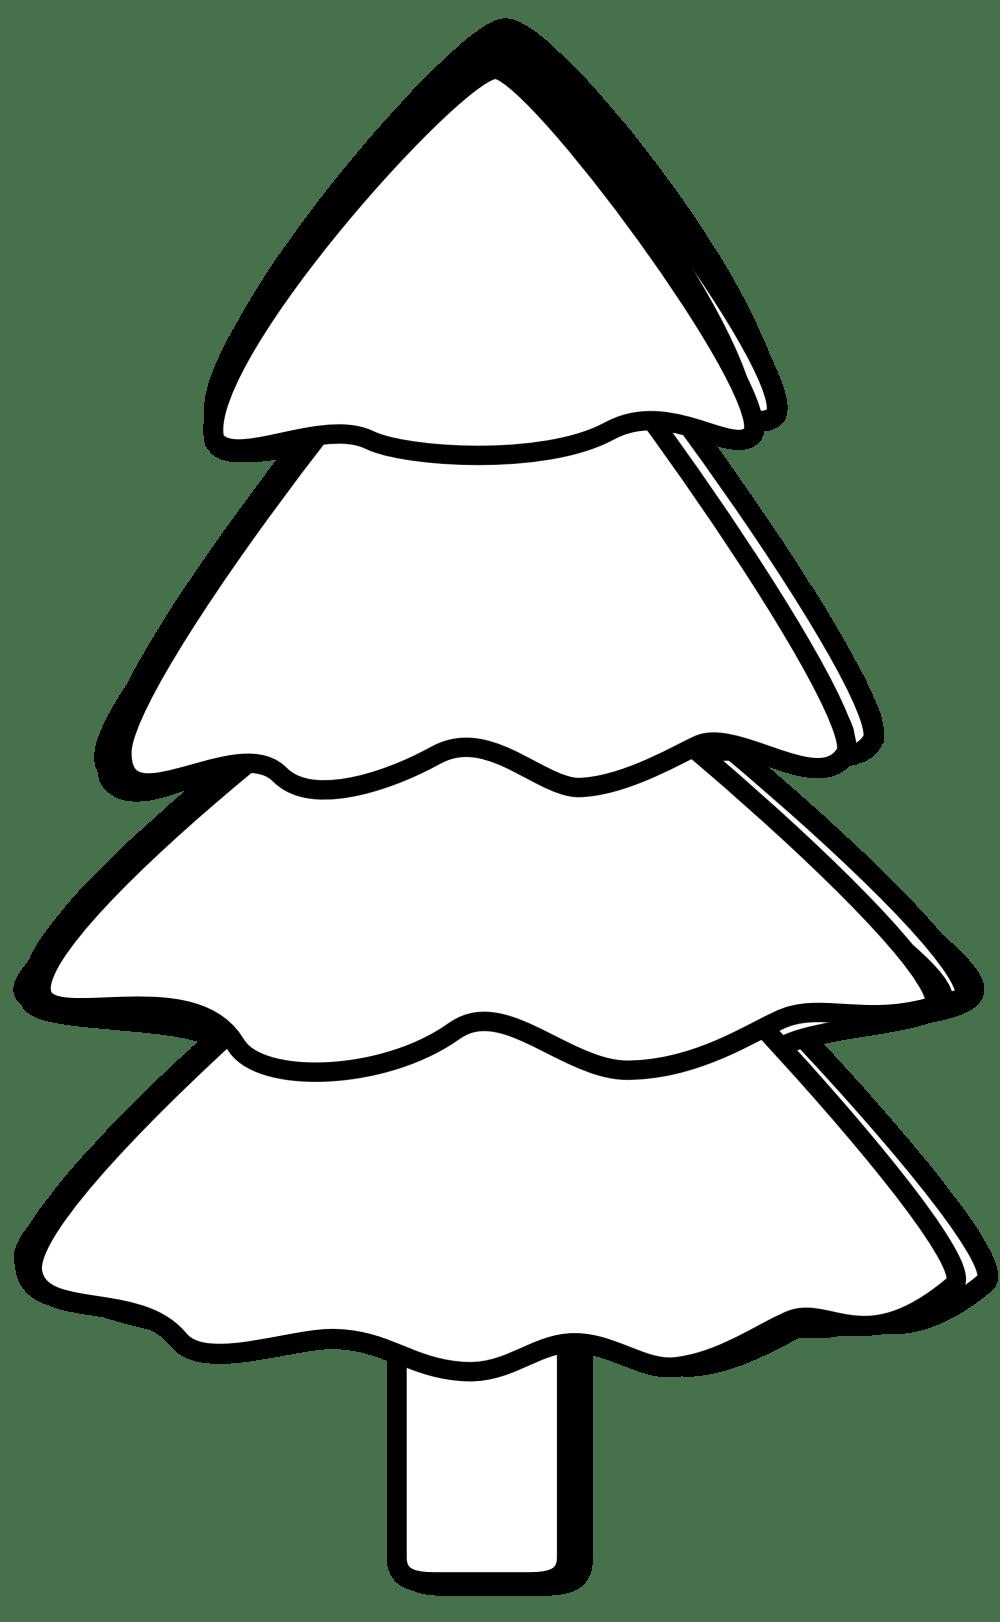 medium resolution of harmonic tree black white line art christmas xmas coloring book